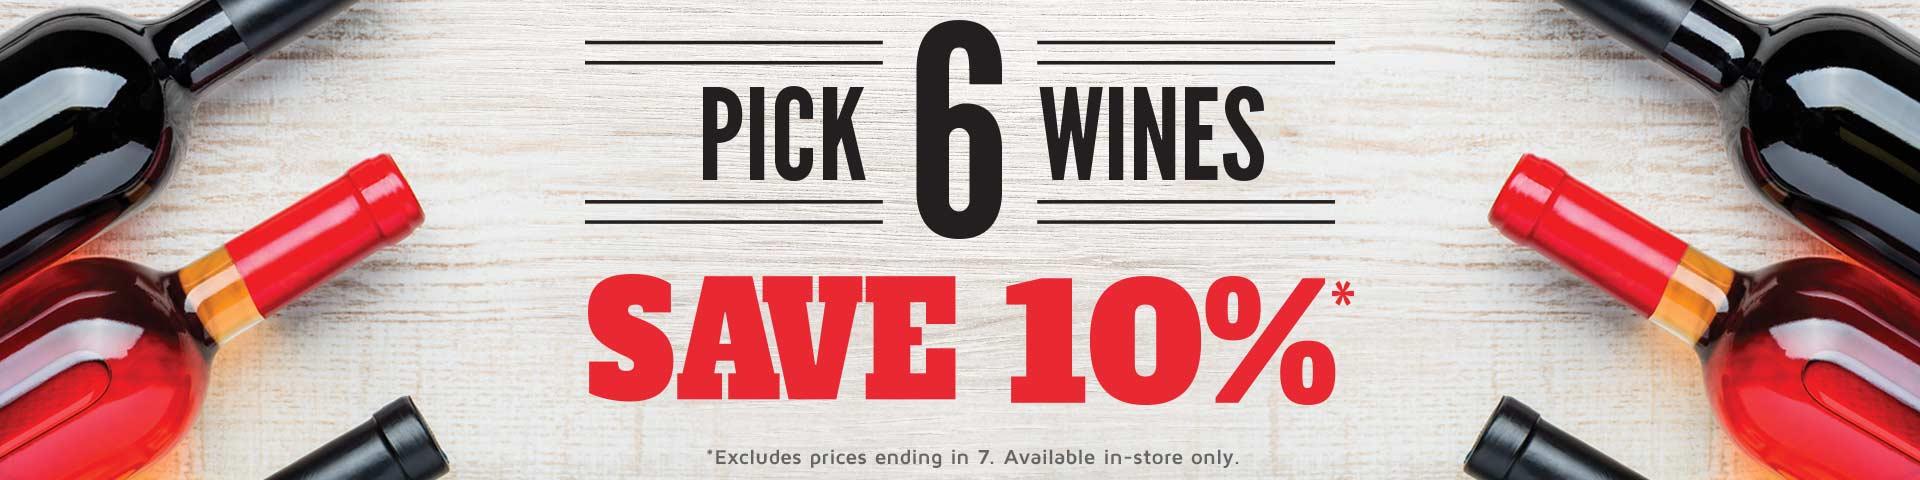 Pick 6 Wines, Save 10%